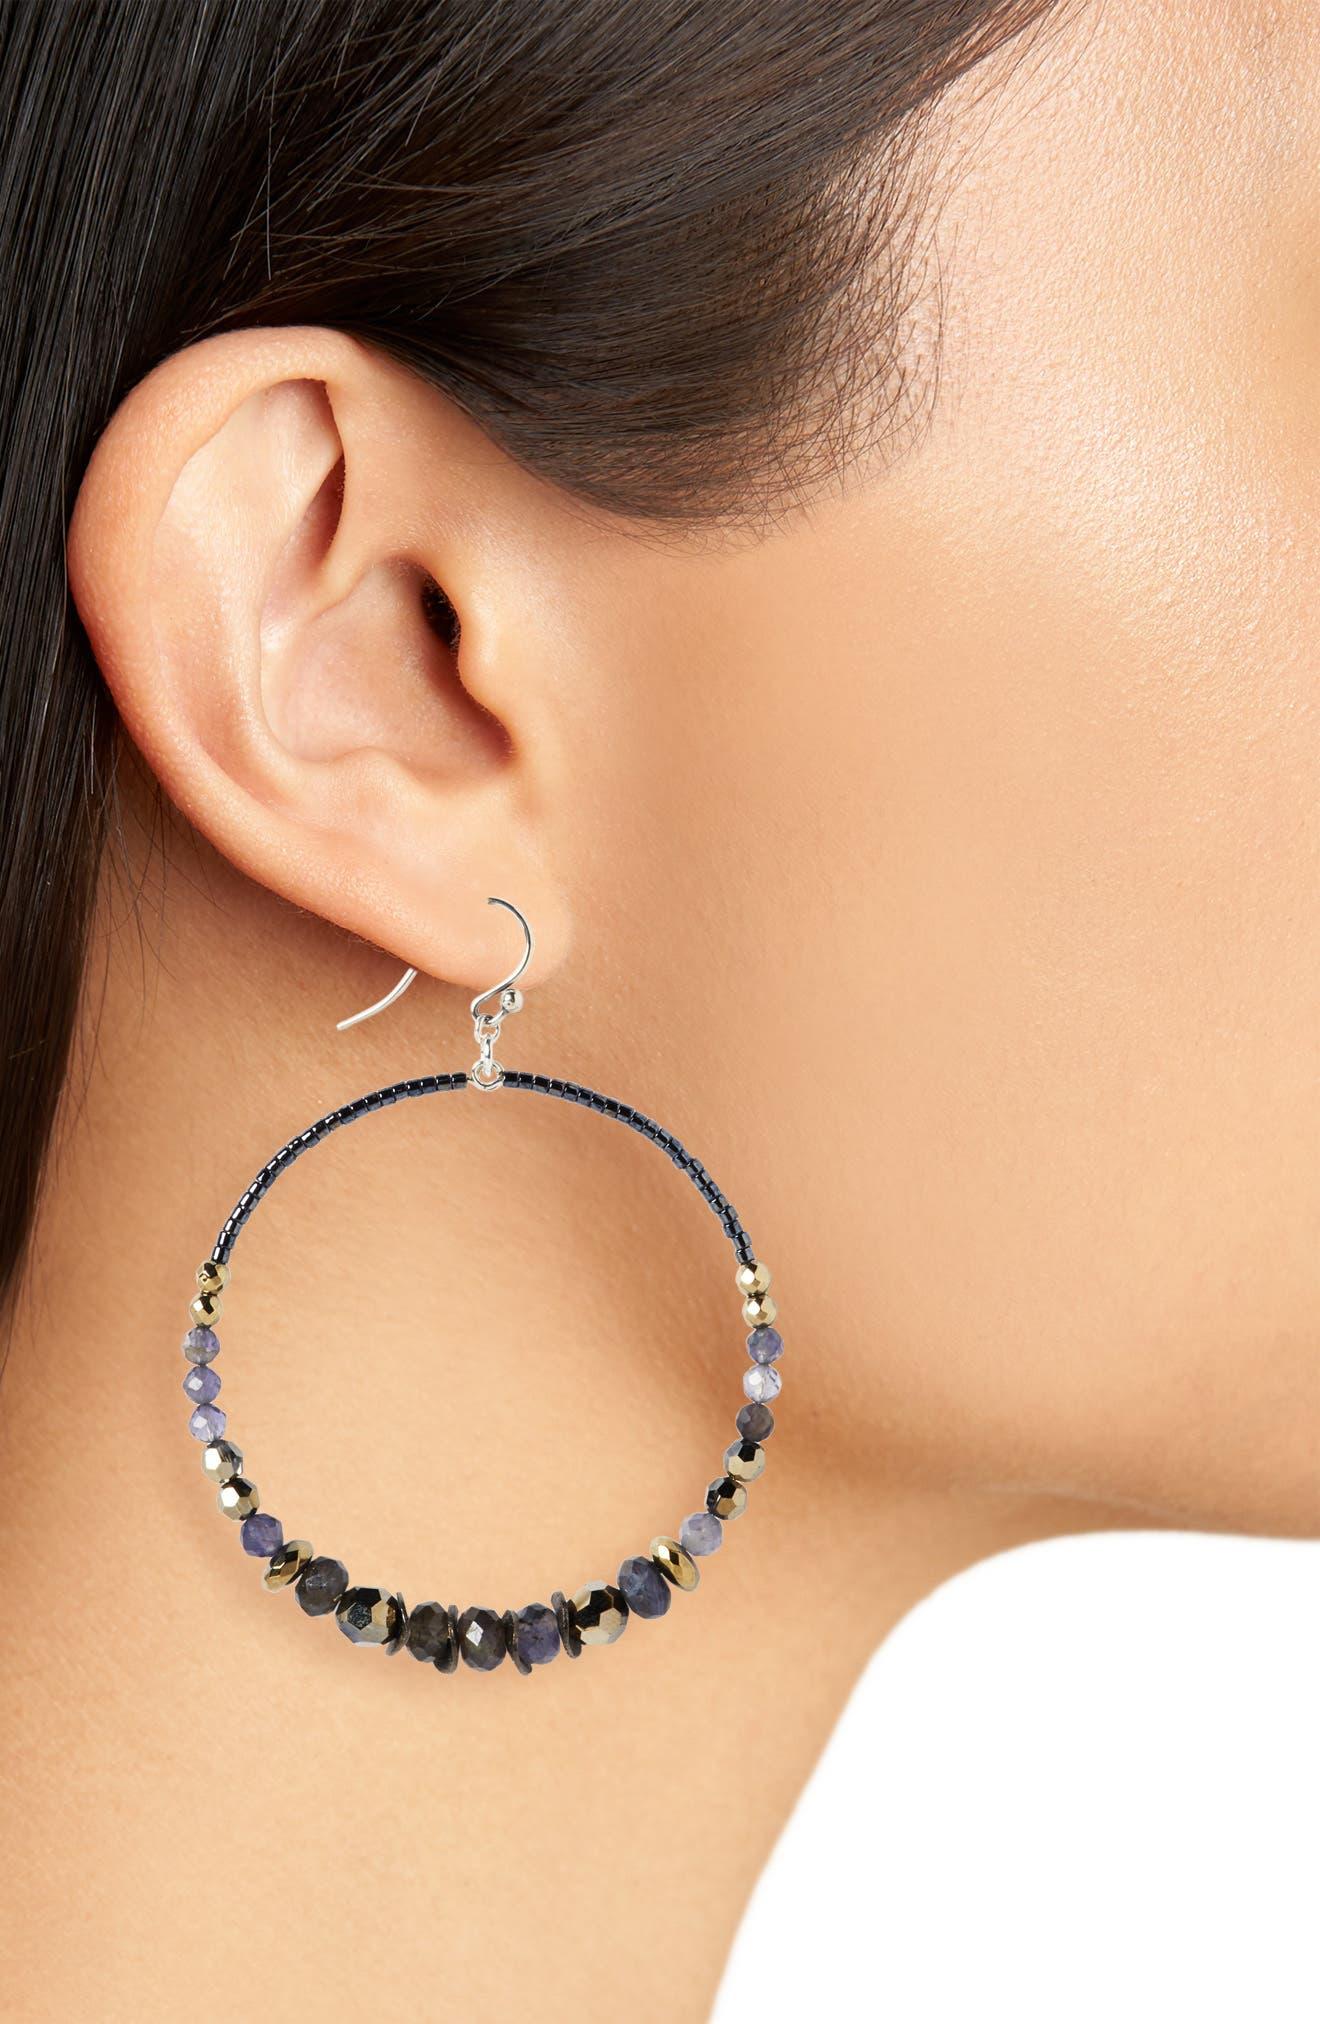 Mixed Stone & Crystal Hoop Earrings,                             Alternate thumbnail 2, color,                             METALLIC LIGHT GOLD MIX